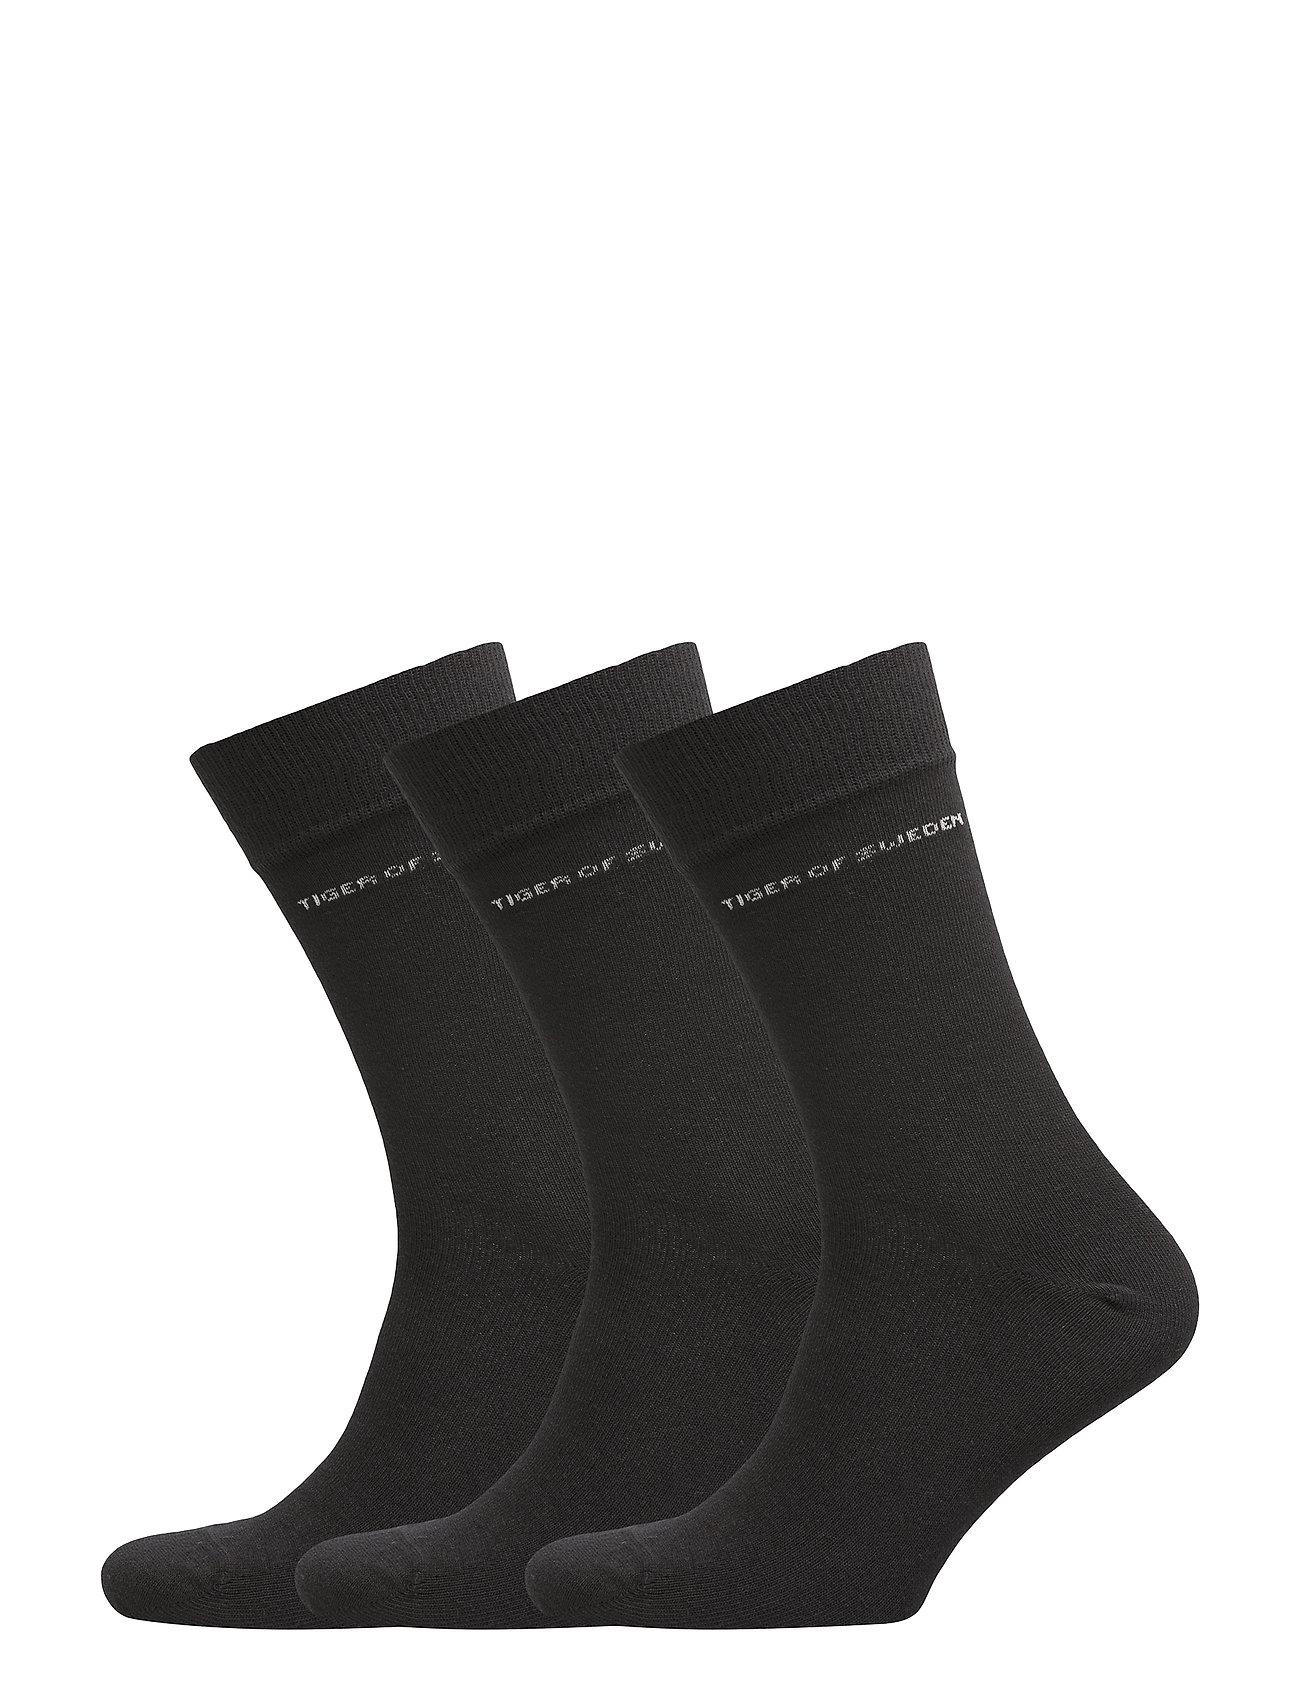 Image of Abramio Underwear Socks Regular Socks Sort Tiger Of Sweden (3442838039)